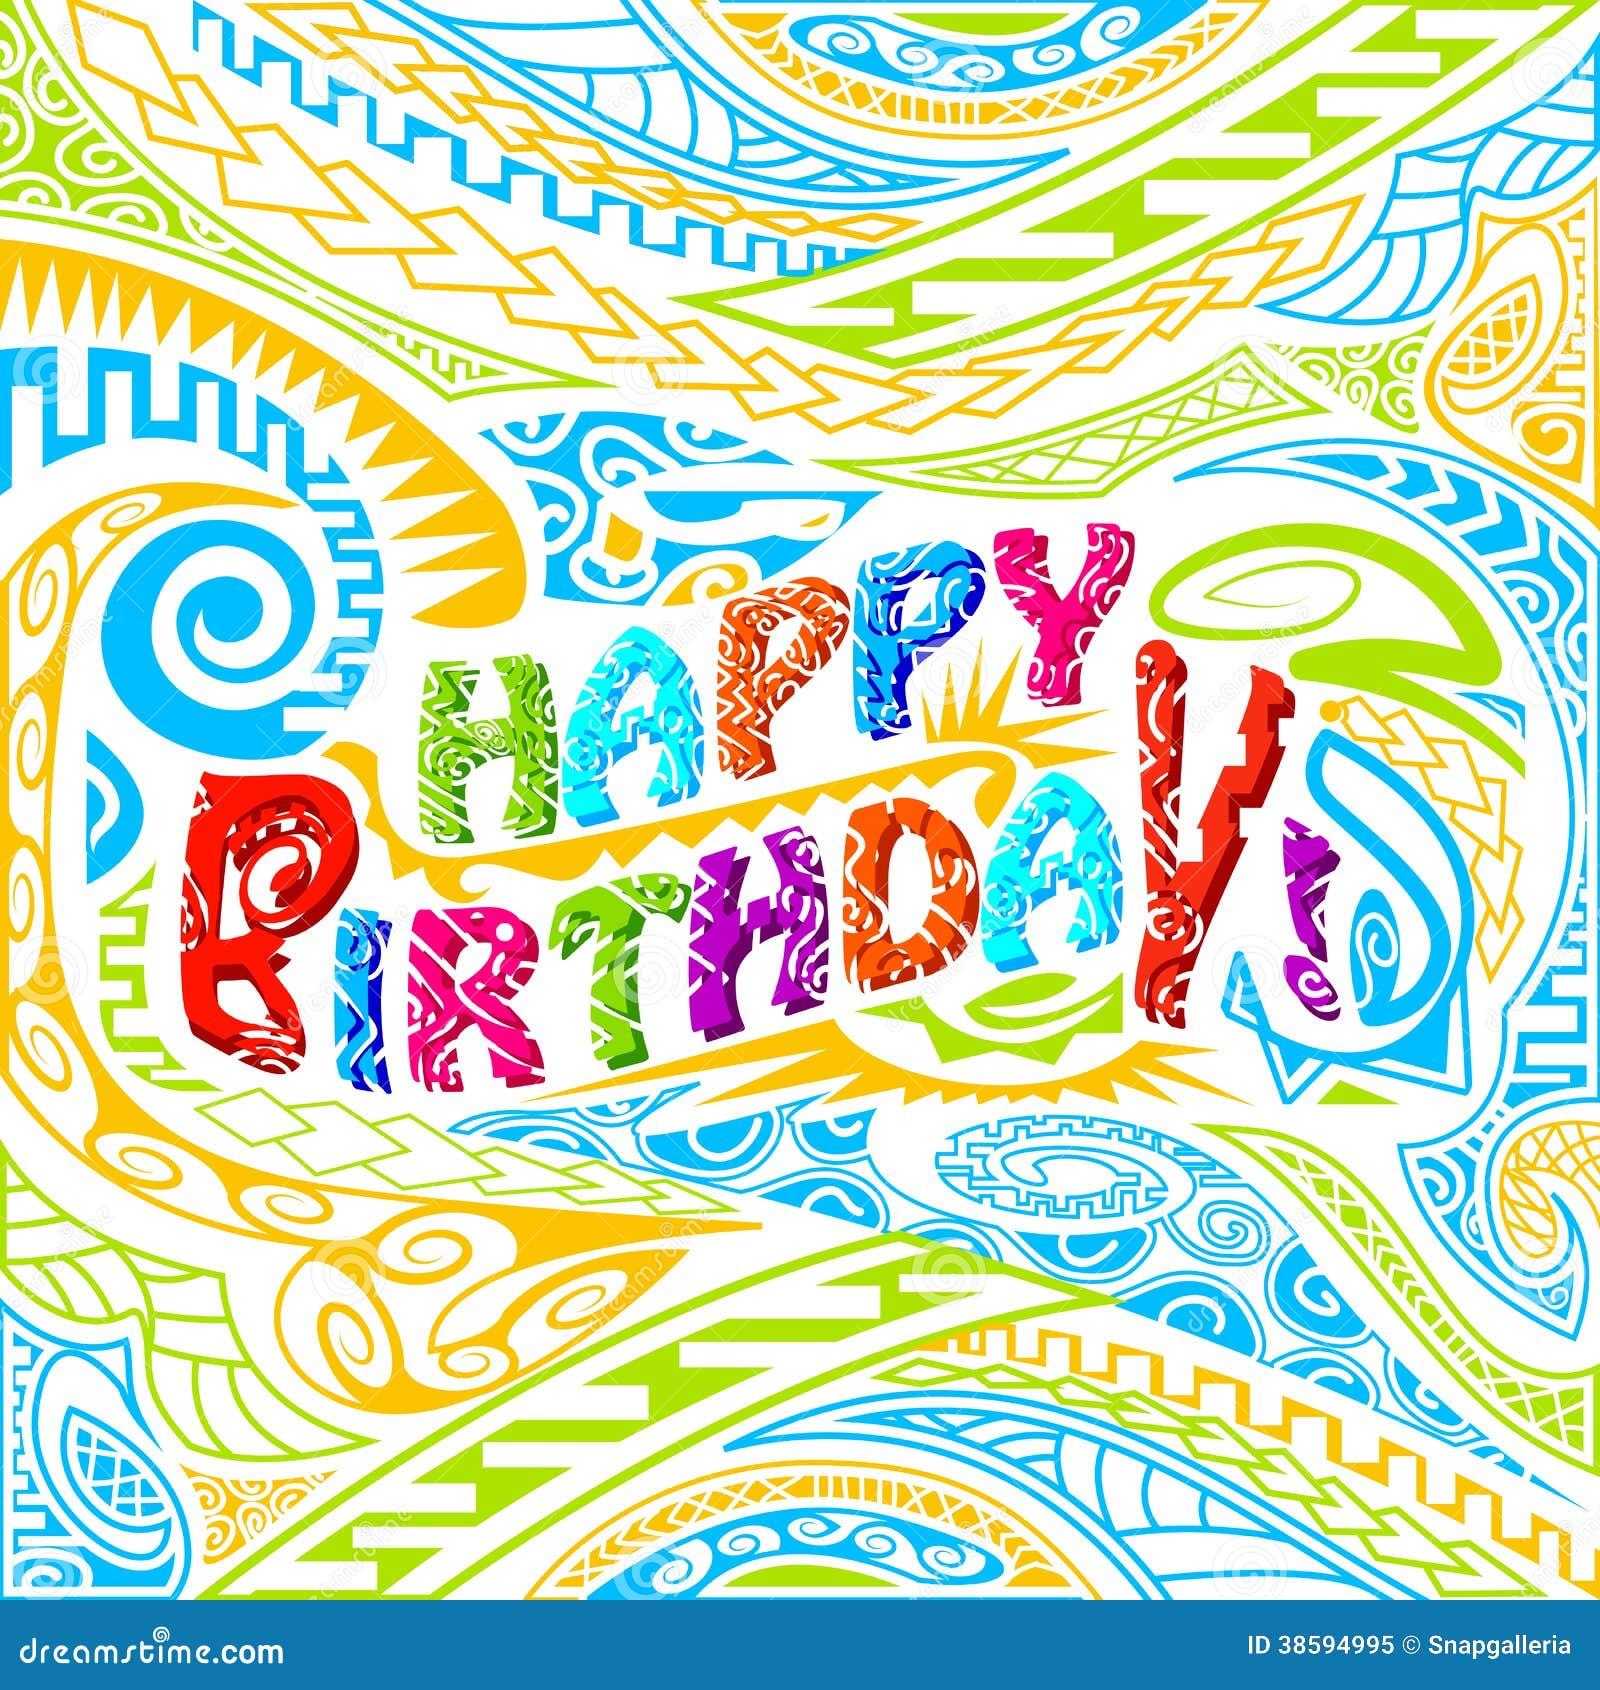 Tiki Style Happy Birthday Typography Royalty Free Stock Photo - Image ...